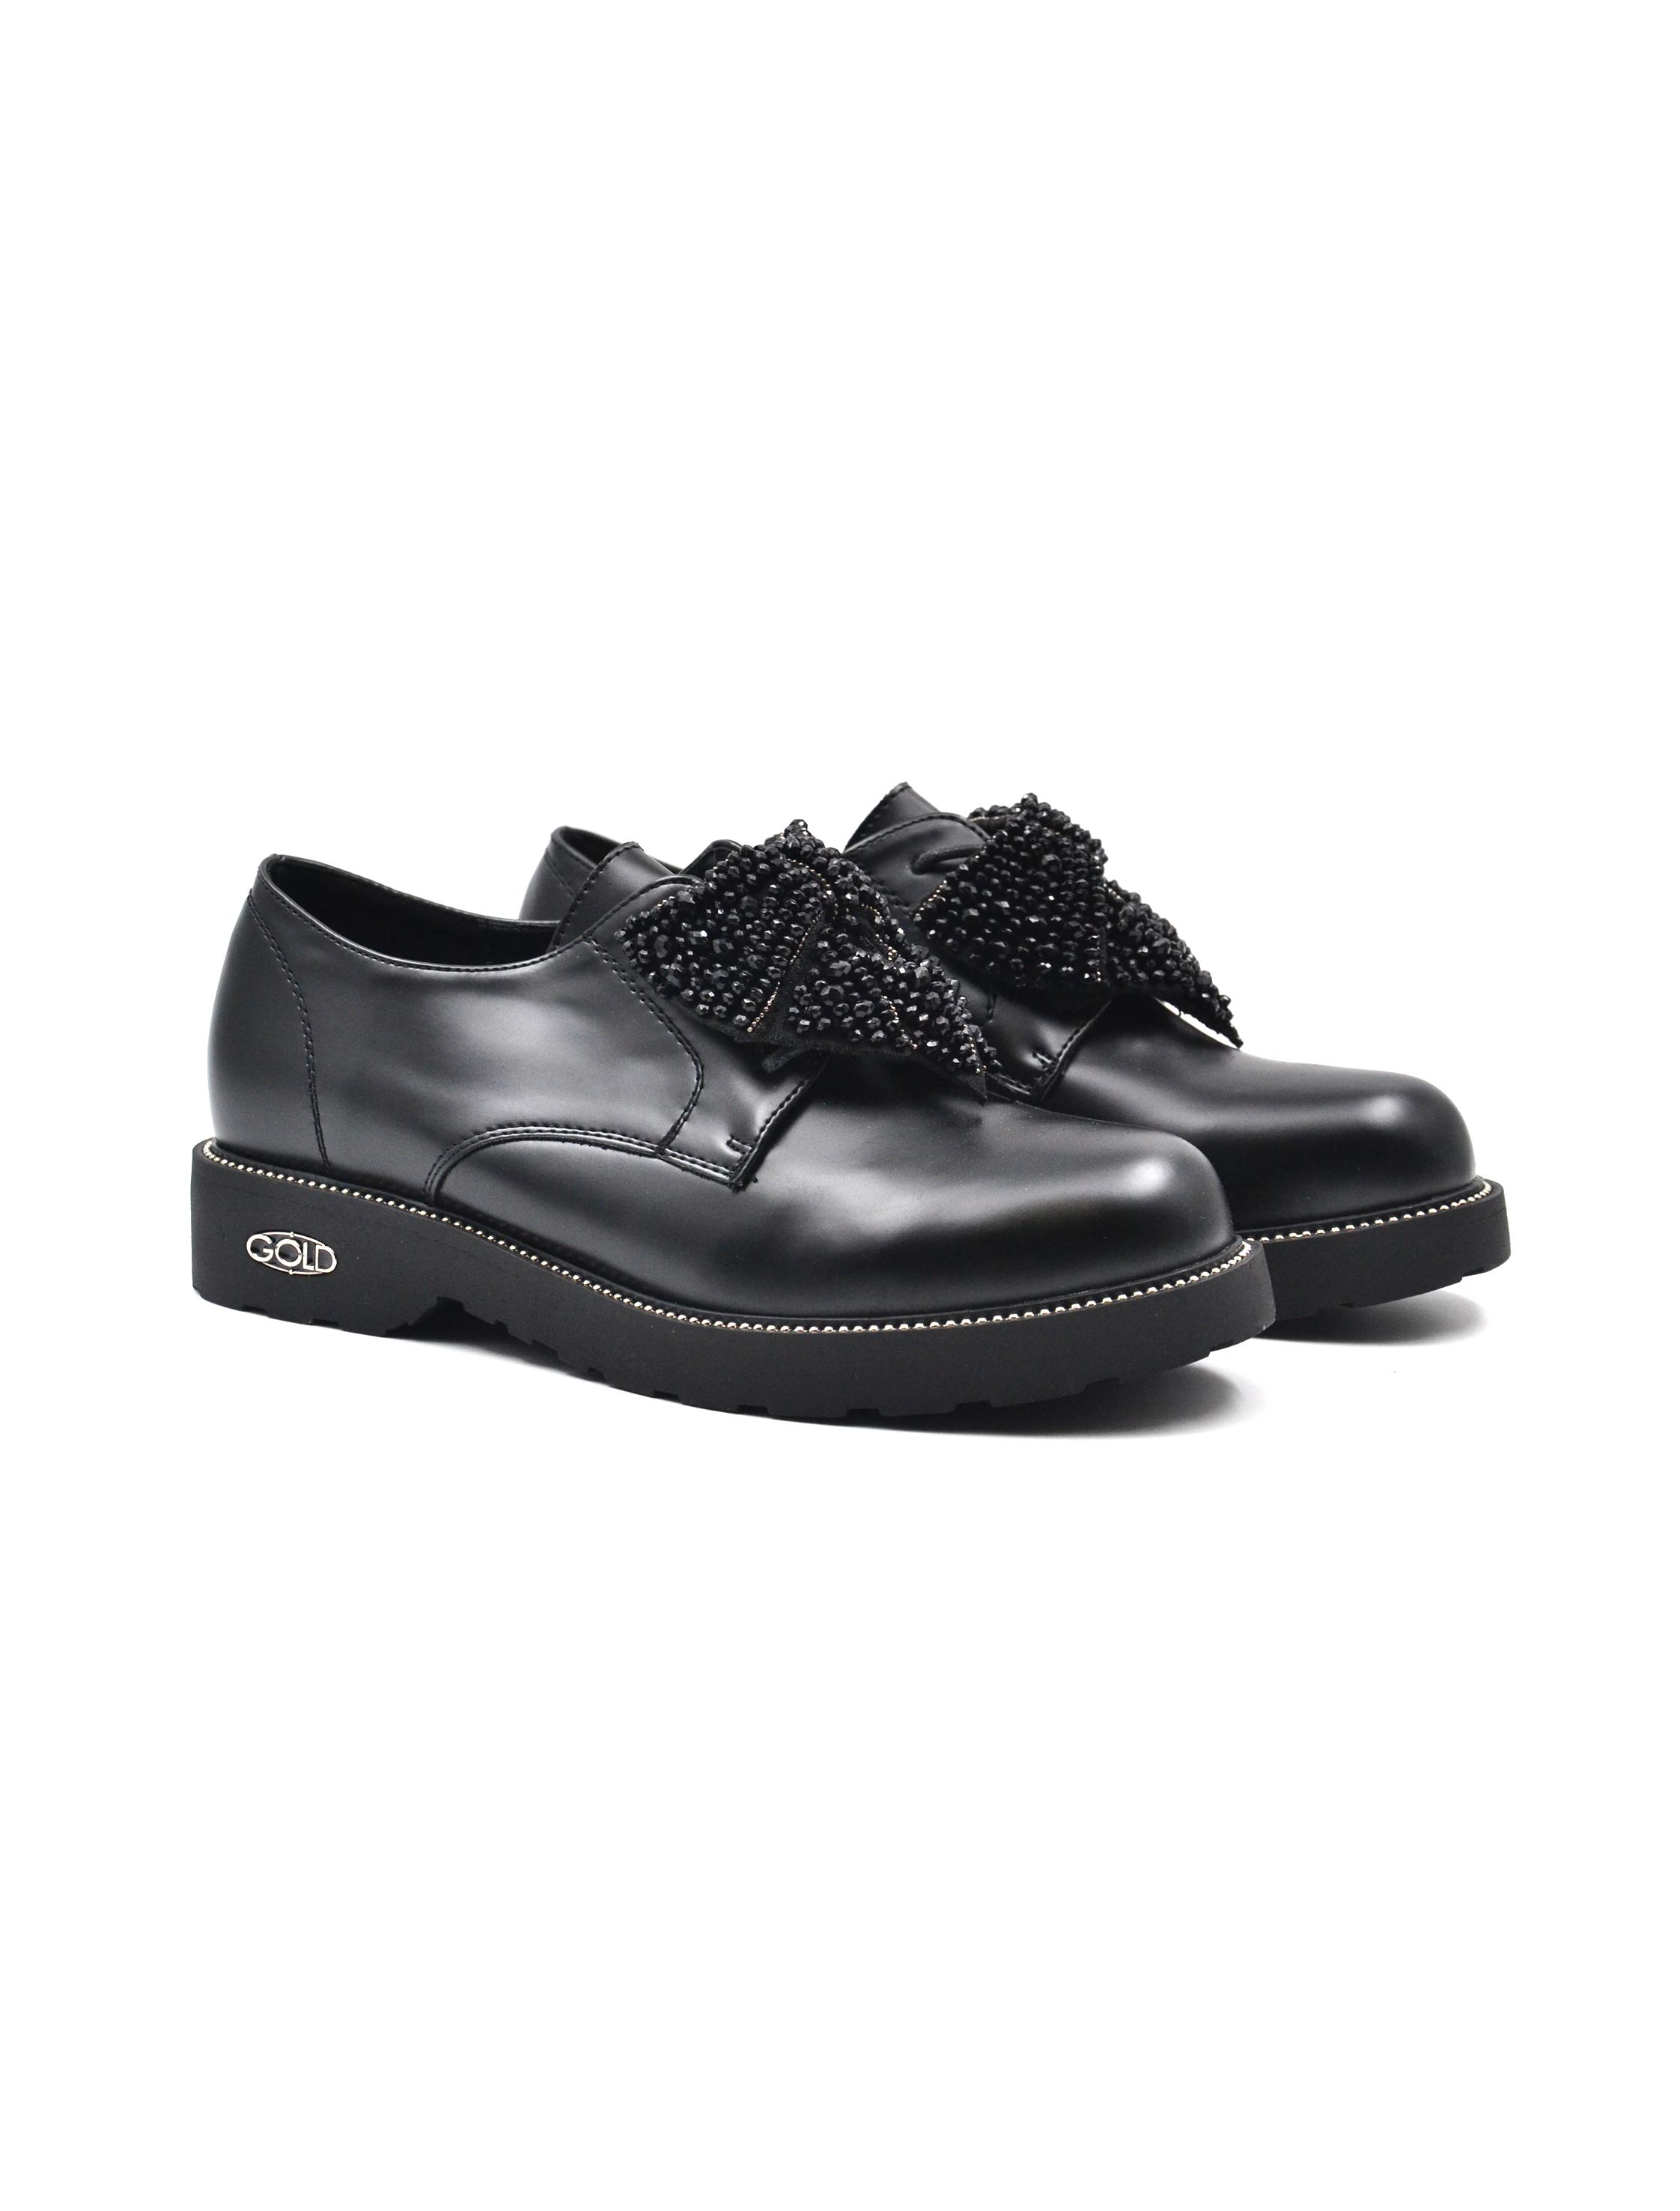 Moda bimbi: scarpe con i lacci o senza! | Donna Moderna